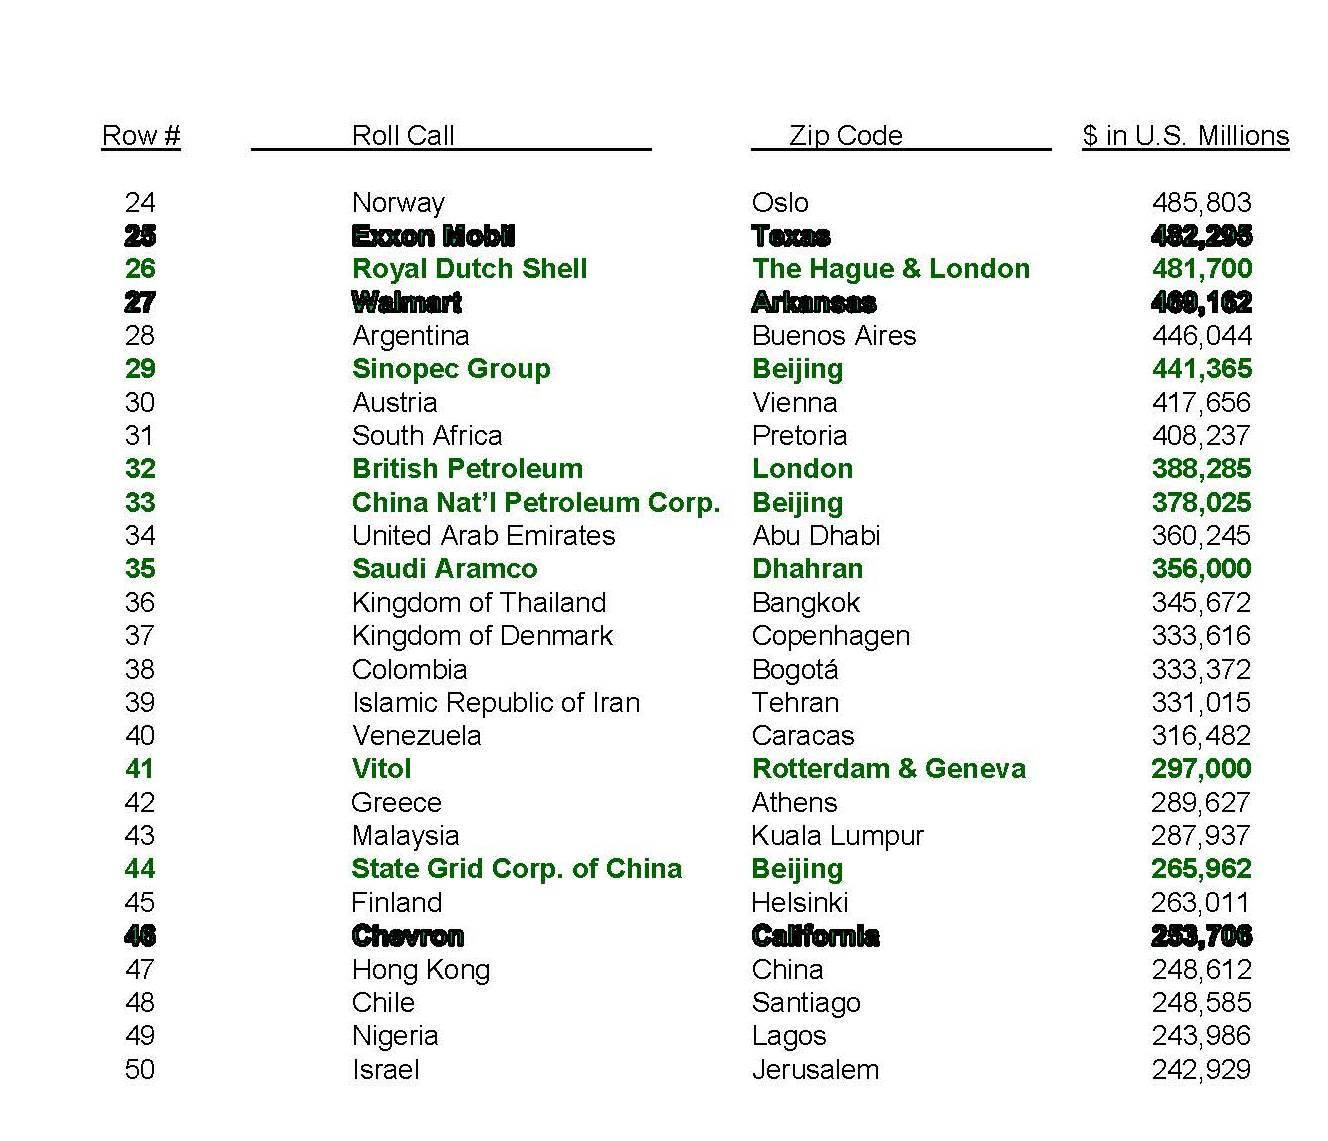 World Bank's 2011 GDP Ranking